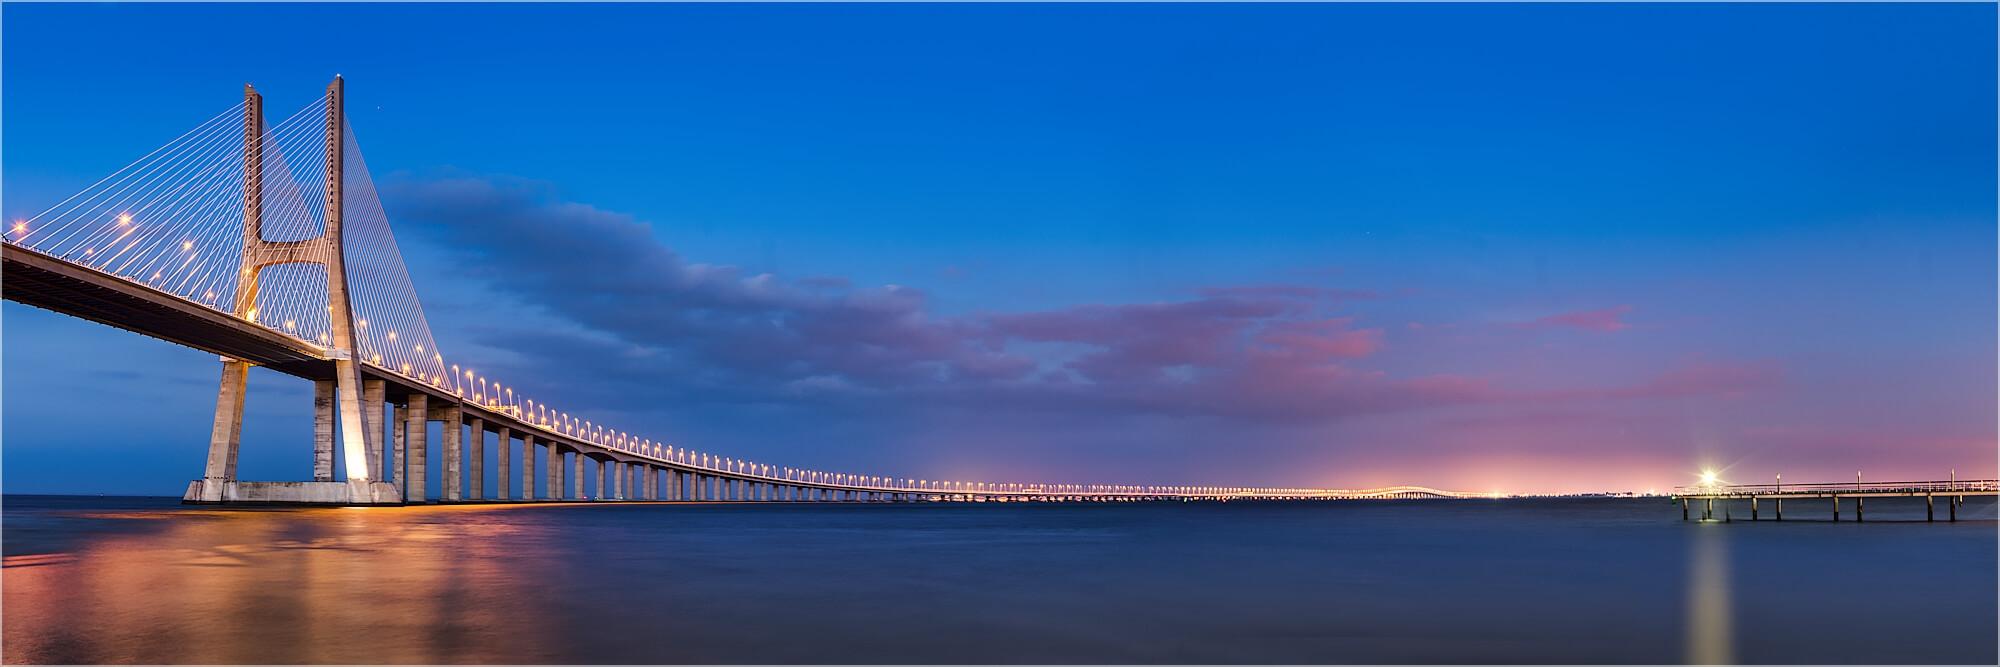 Panoramabild Vasco da Gama Brücke Portugal Lissabon